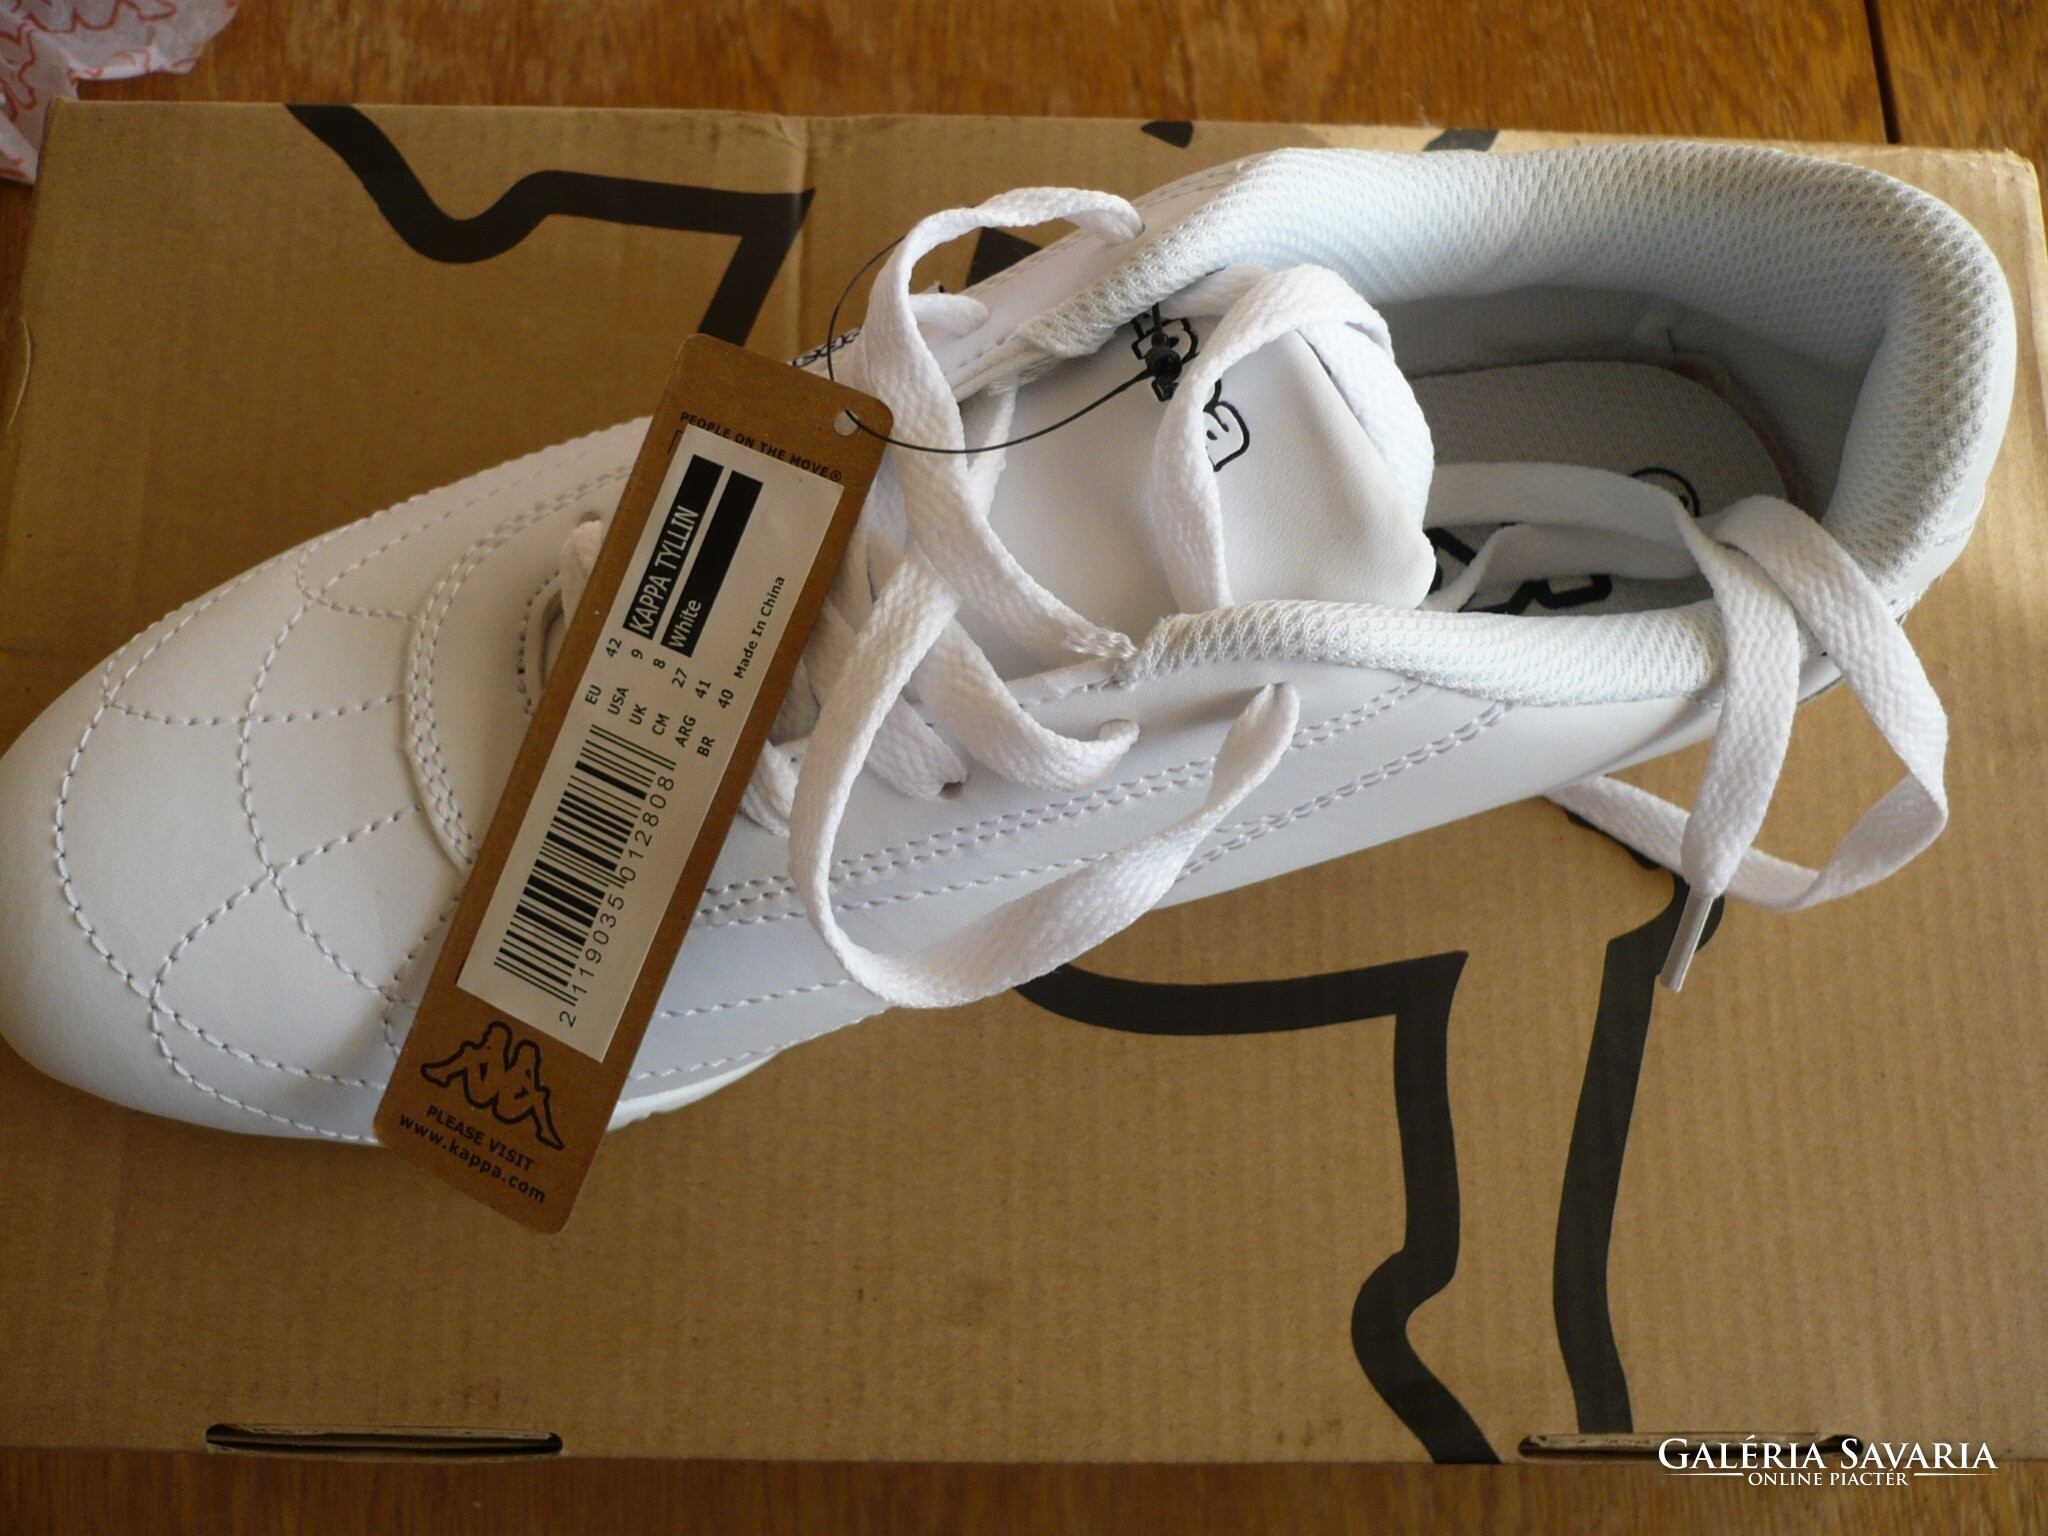 cd5875ccfa55 Kappa men's sports shoes in their original packaging - Wardrobe ...